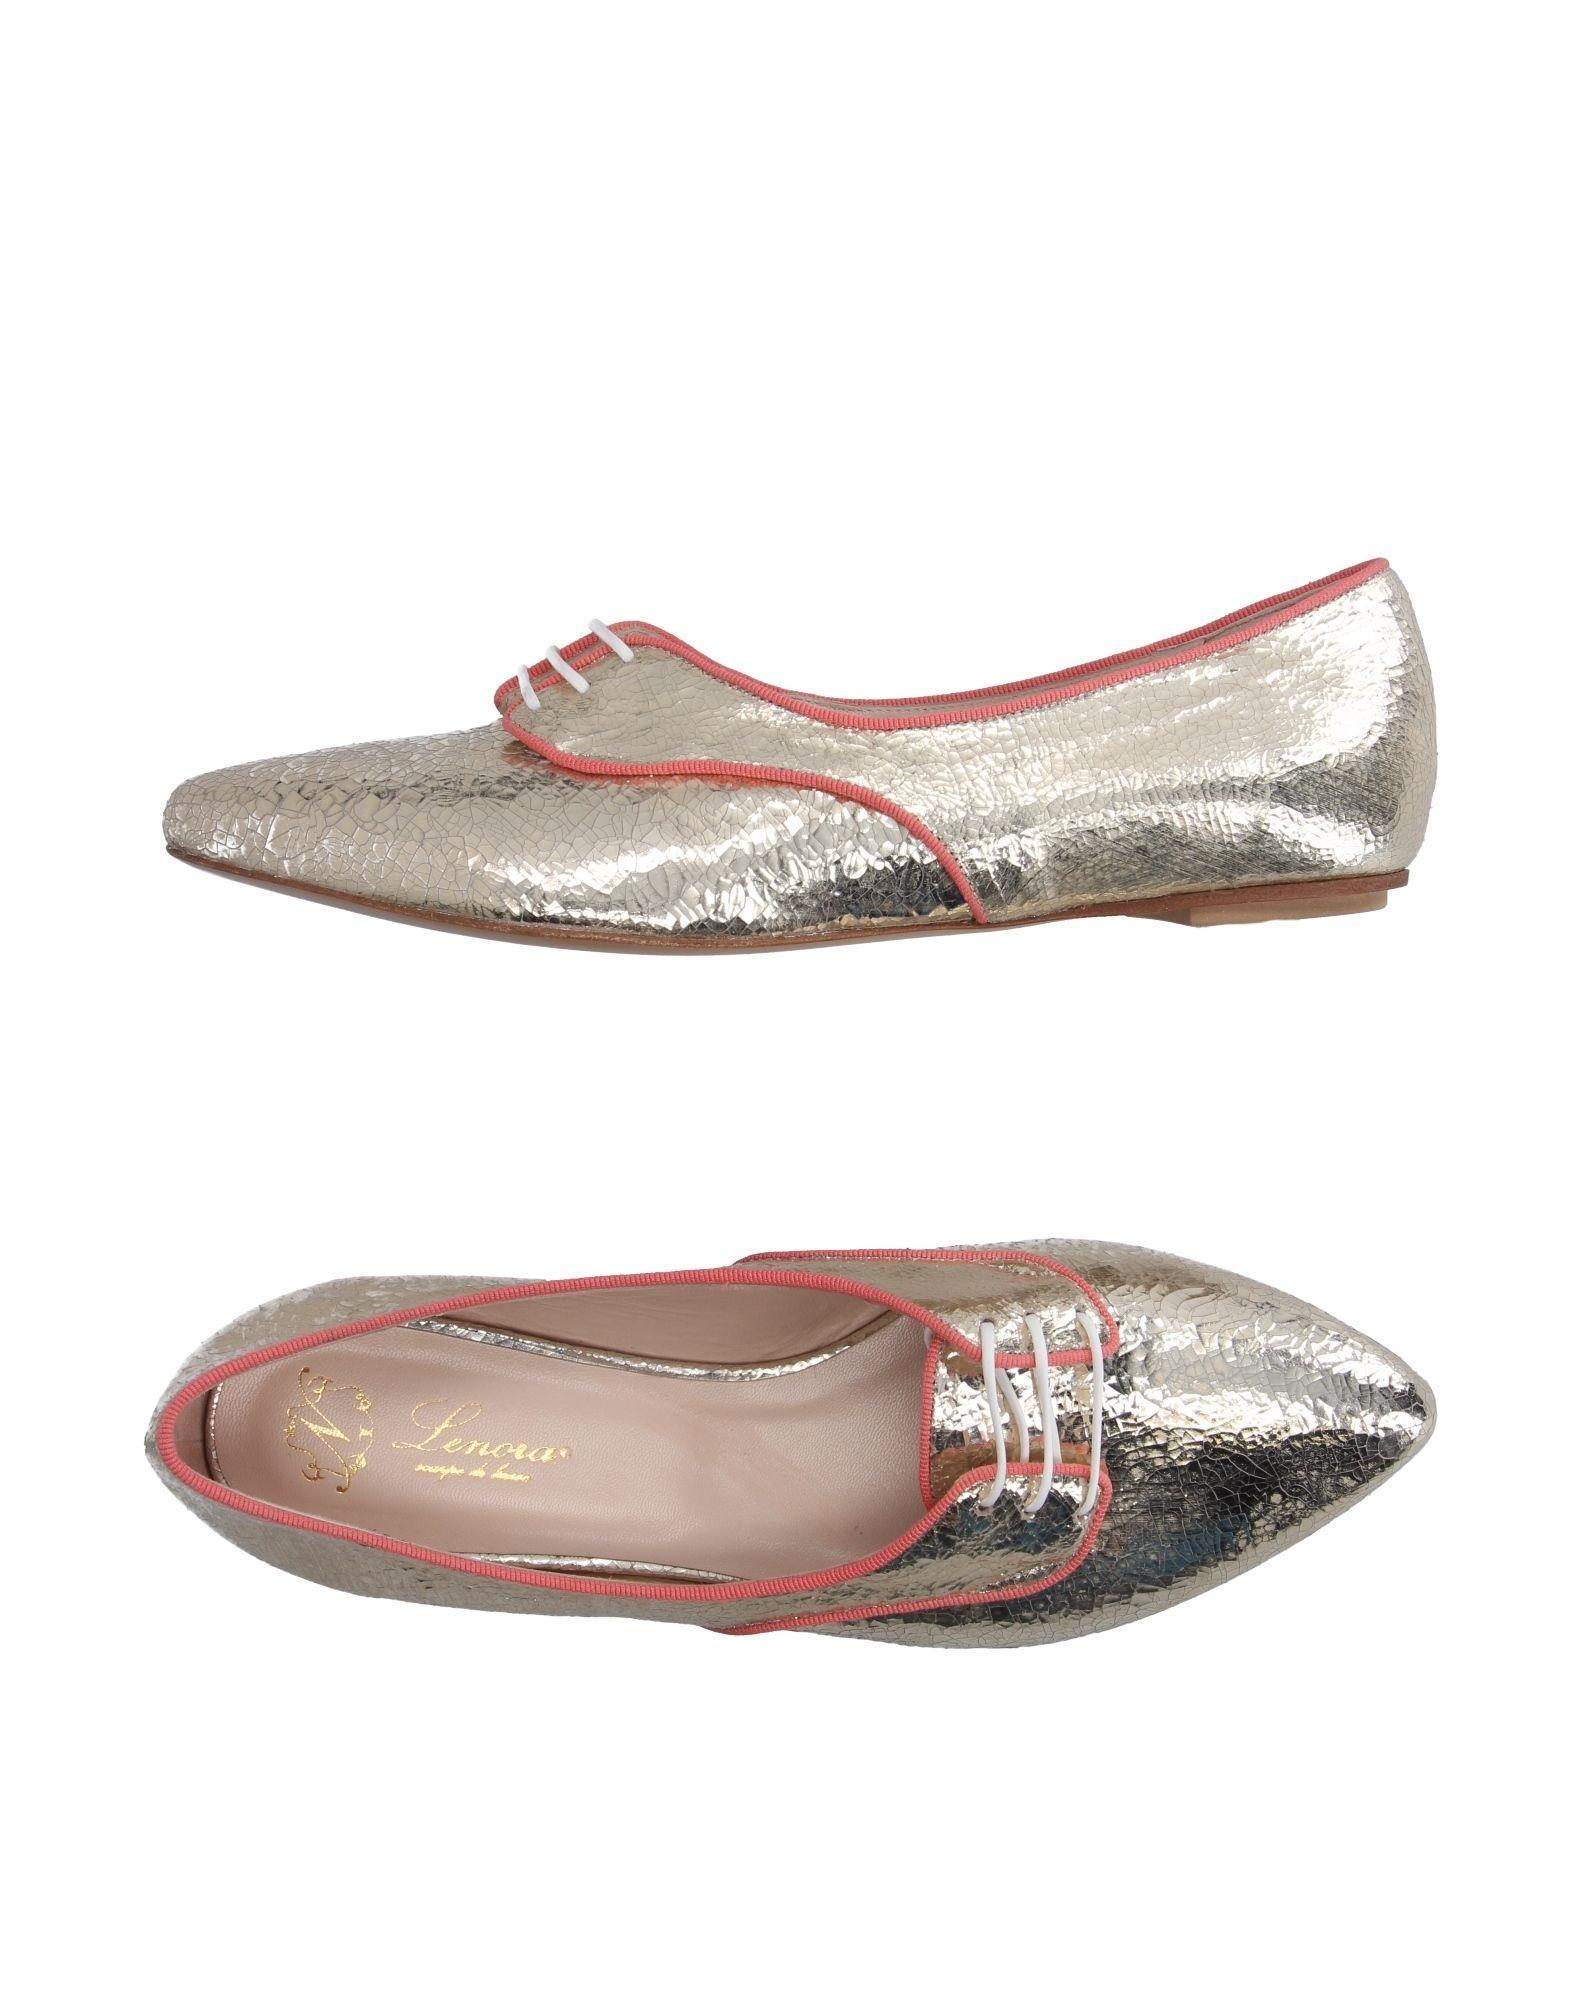 lenora female lenora laceup shoes